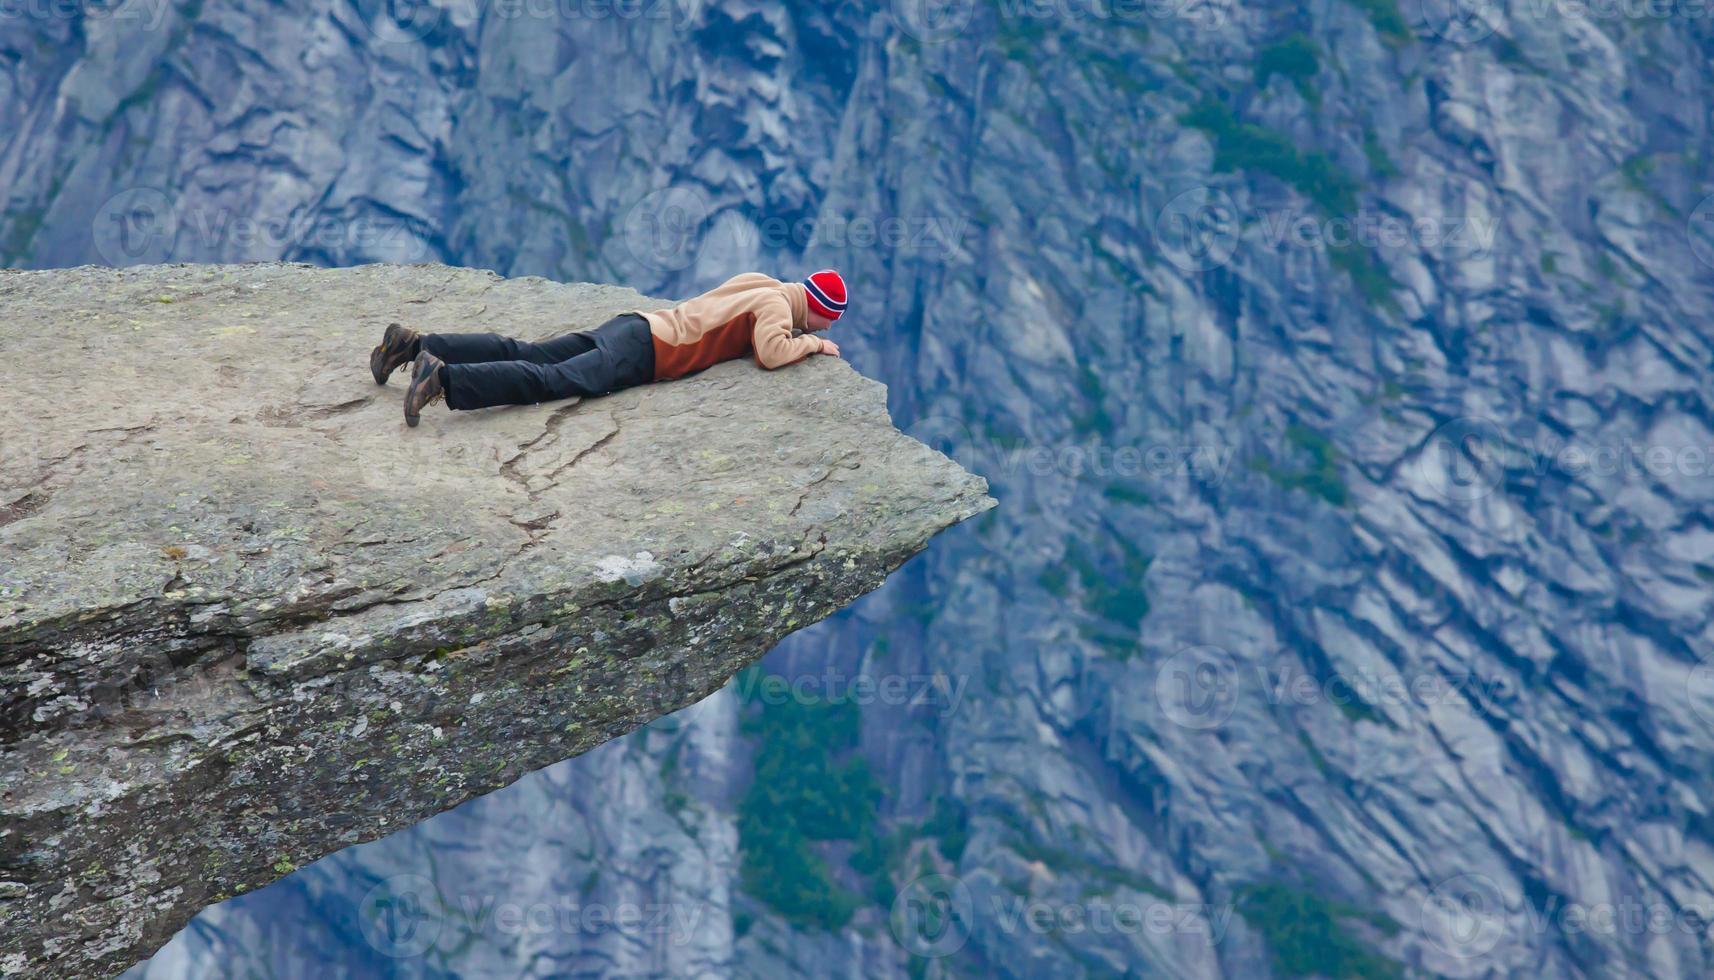 famoso lugar de senderismo de roca noruega - trolltunga, lengua trolls, noruega foto